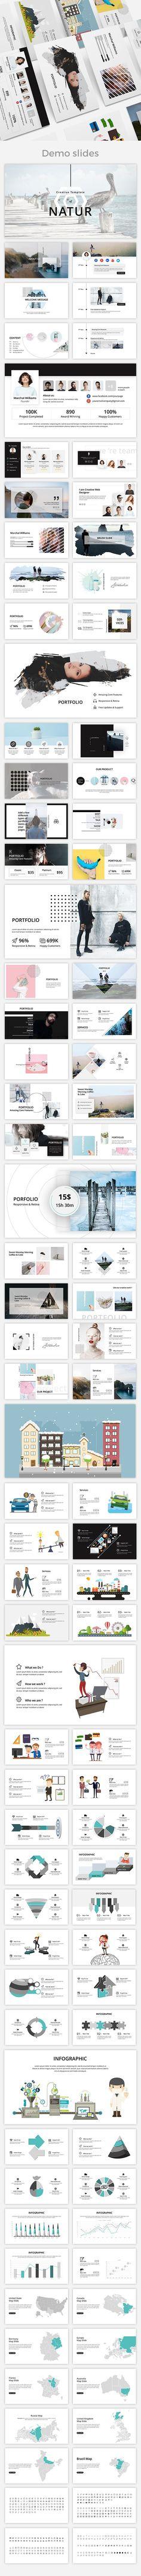 Natur Creative #Powerpoint Template - Creative PowerPoint Templates